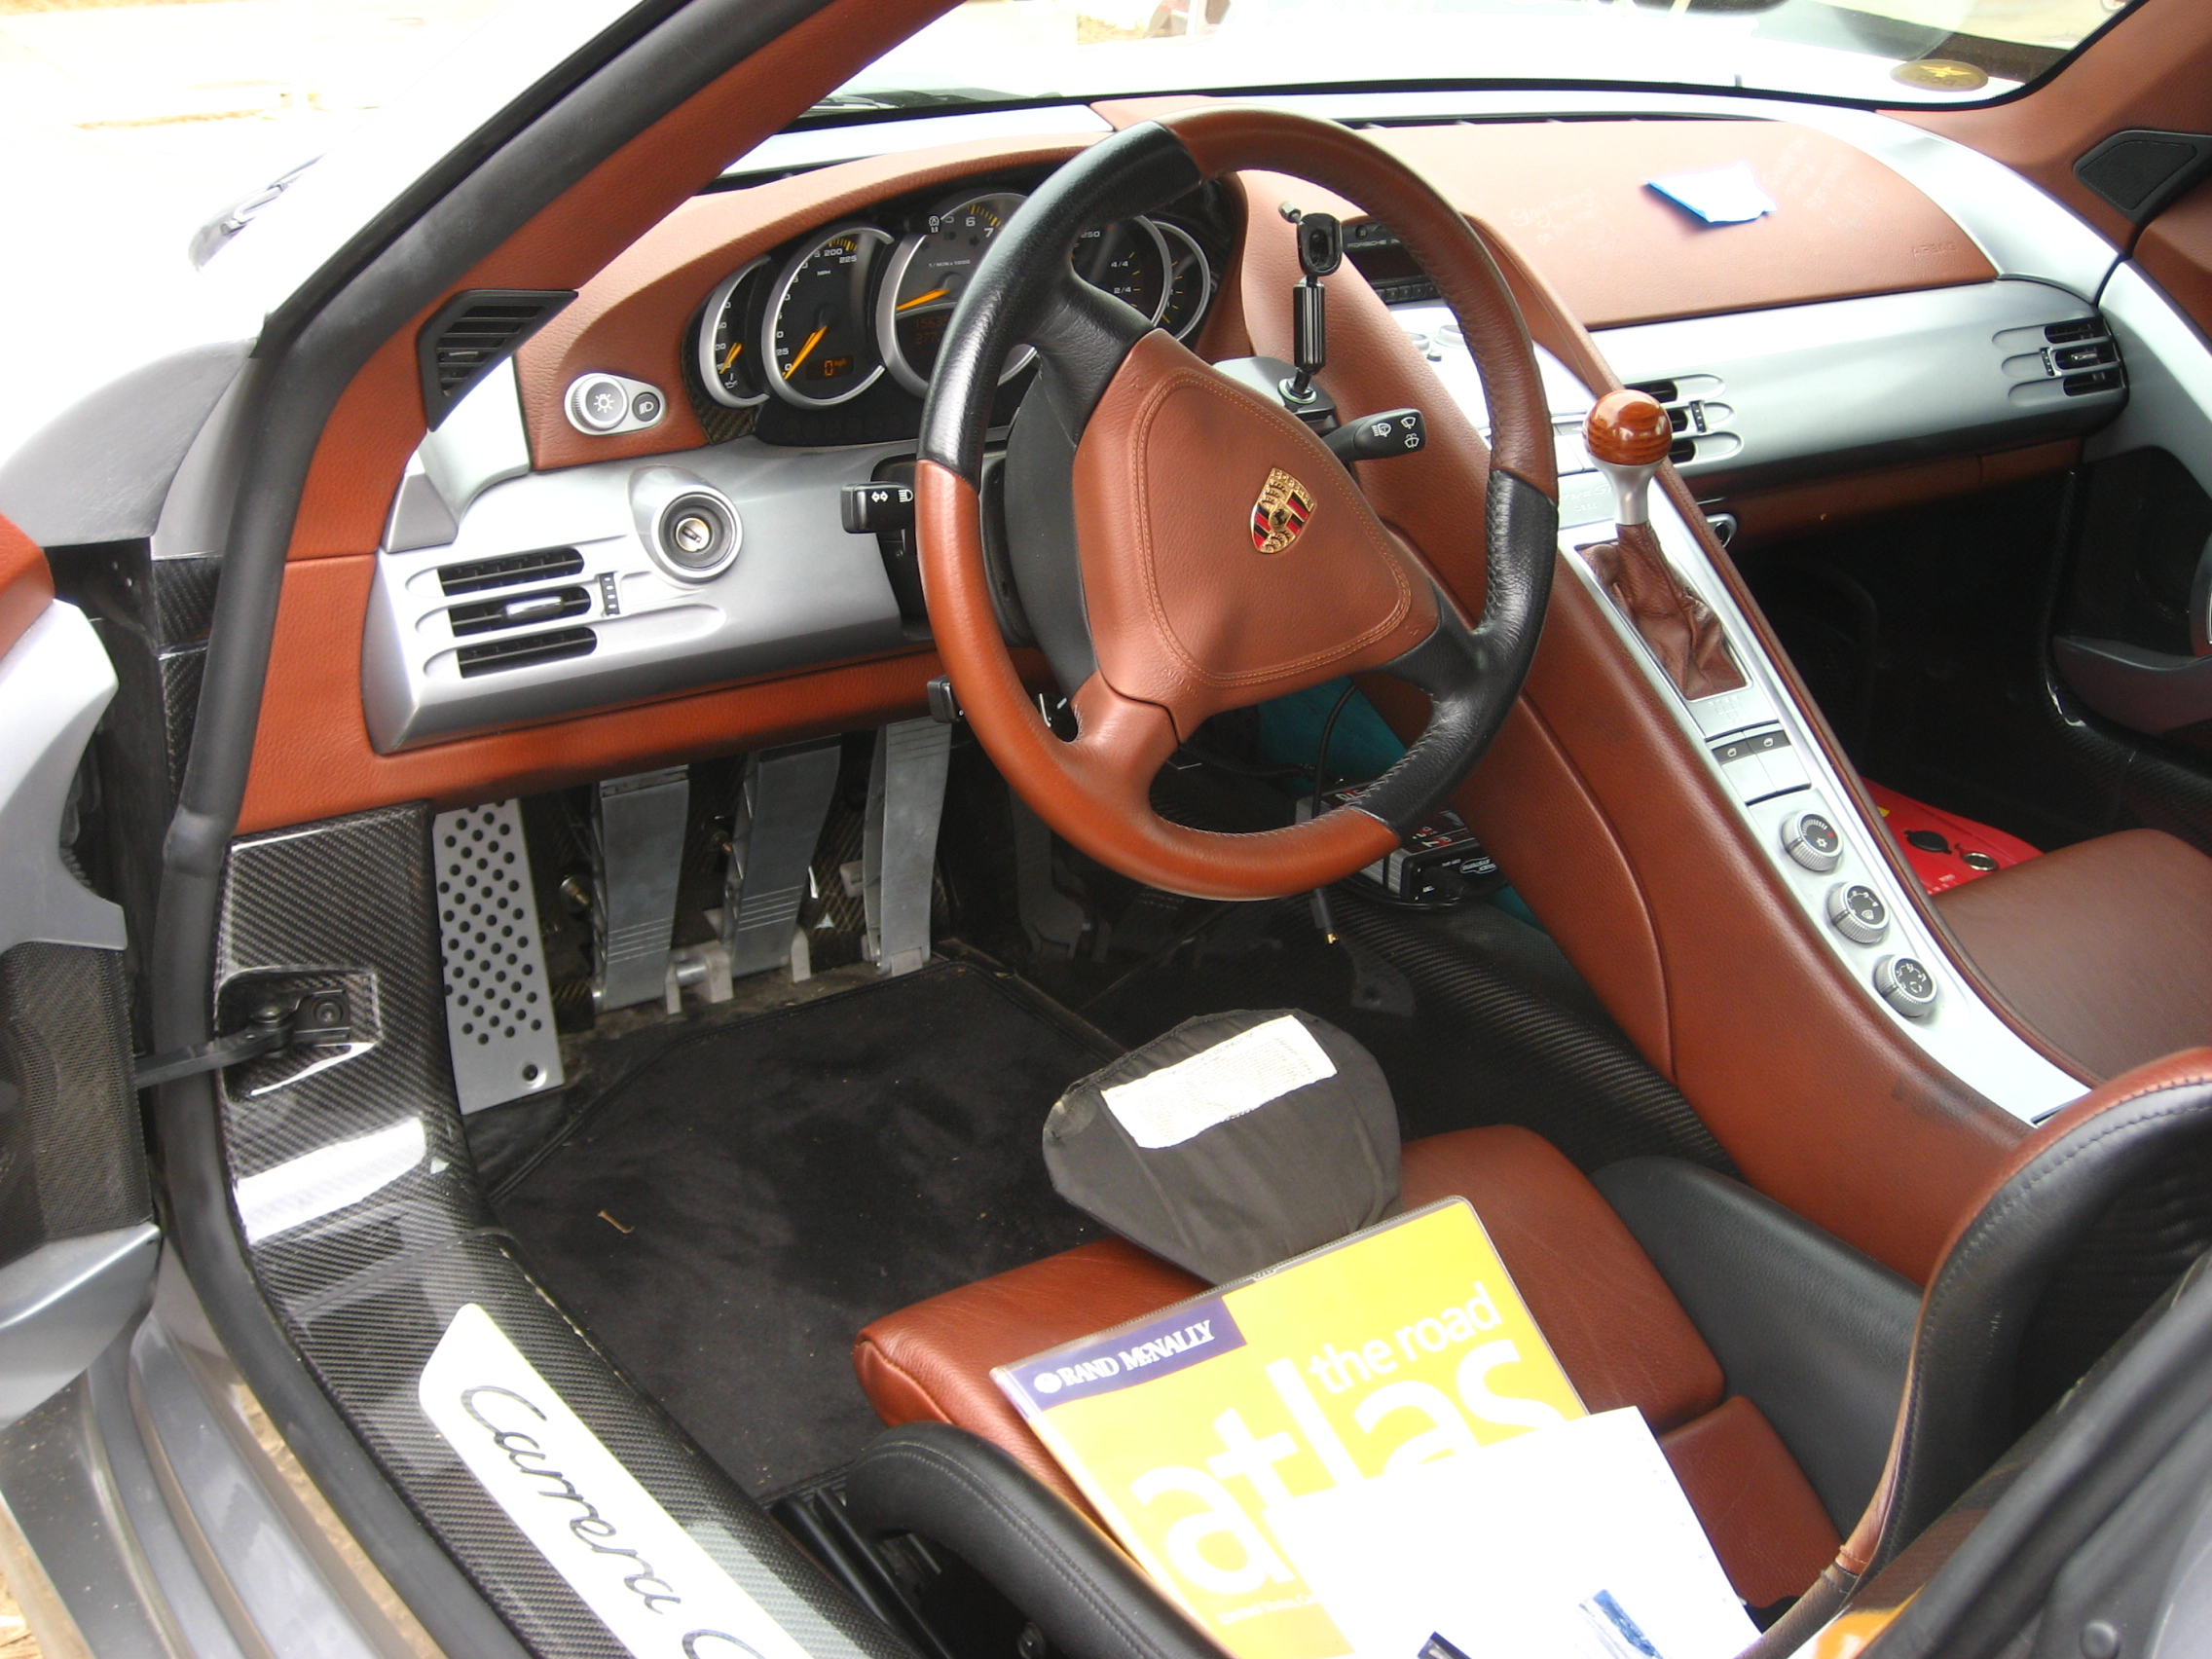 Porsche Carrera gt Interior File:porsche Carrera gt